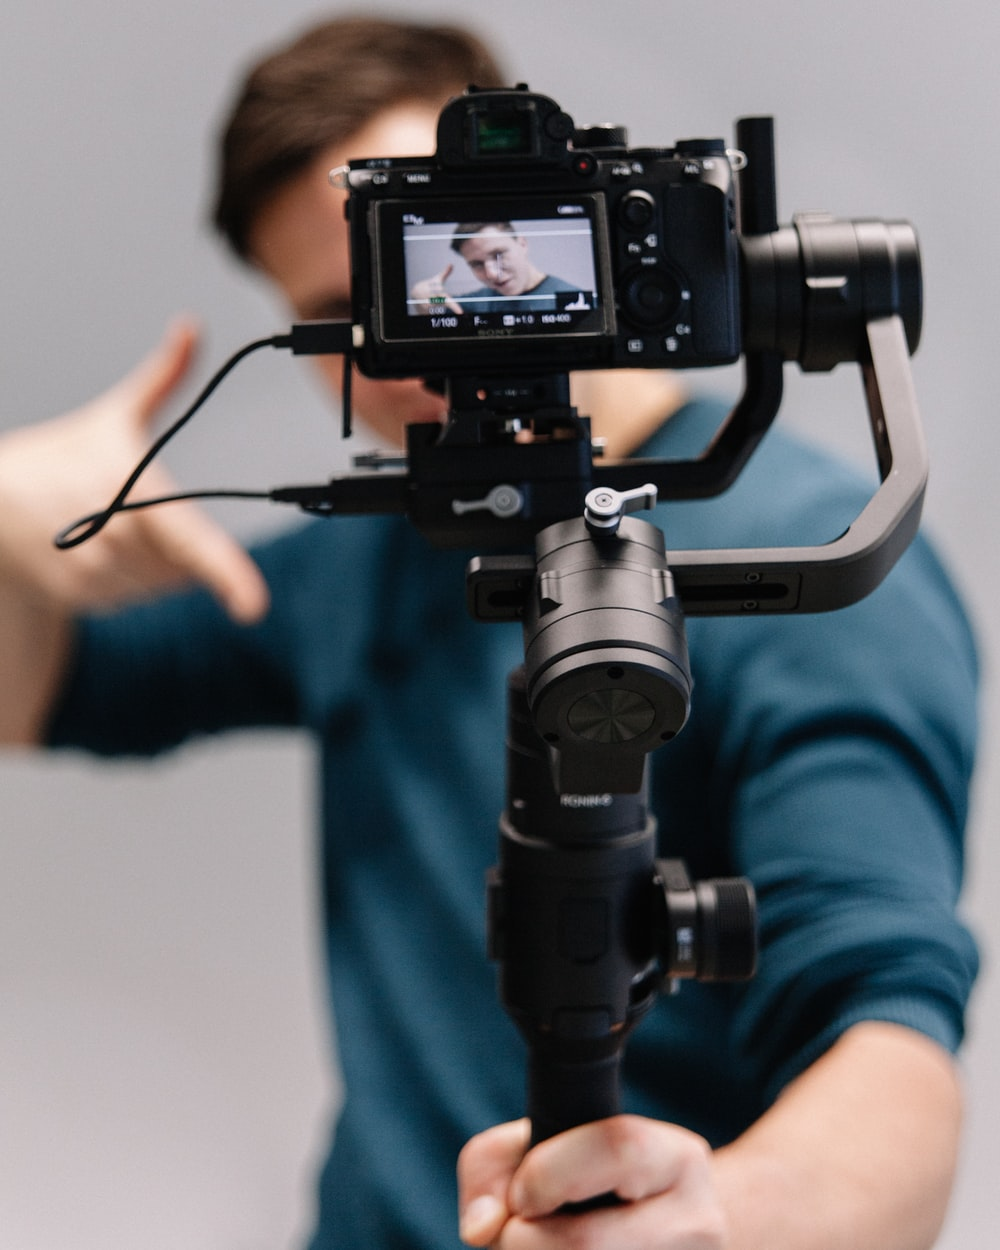 man holding black DSLR camera with stabilizer